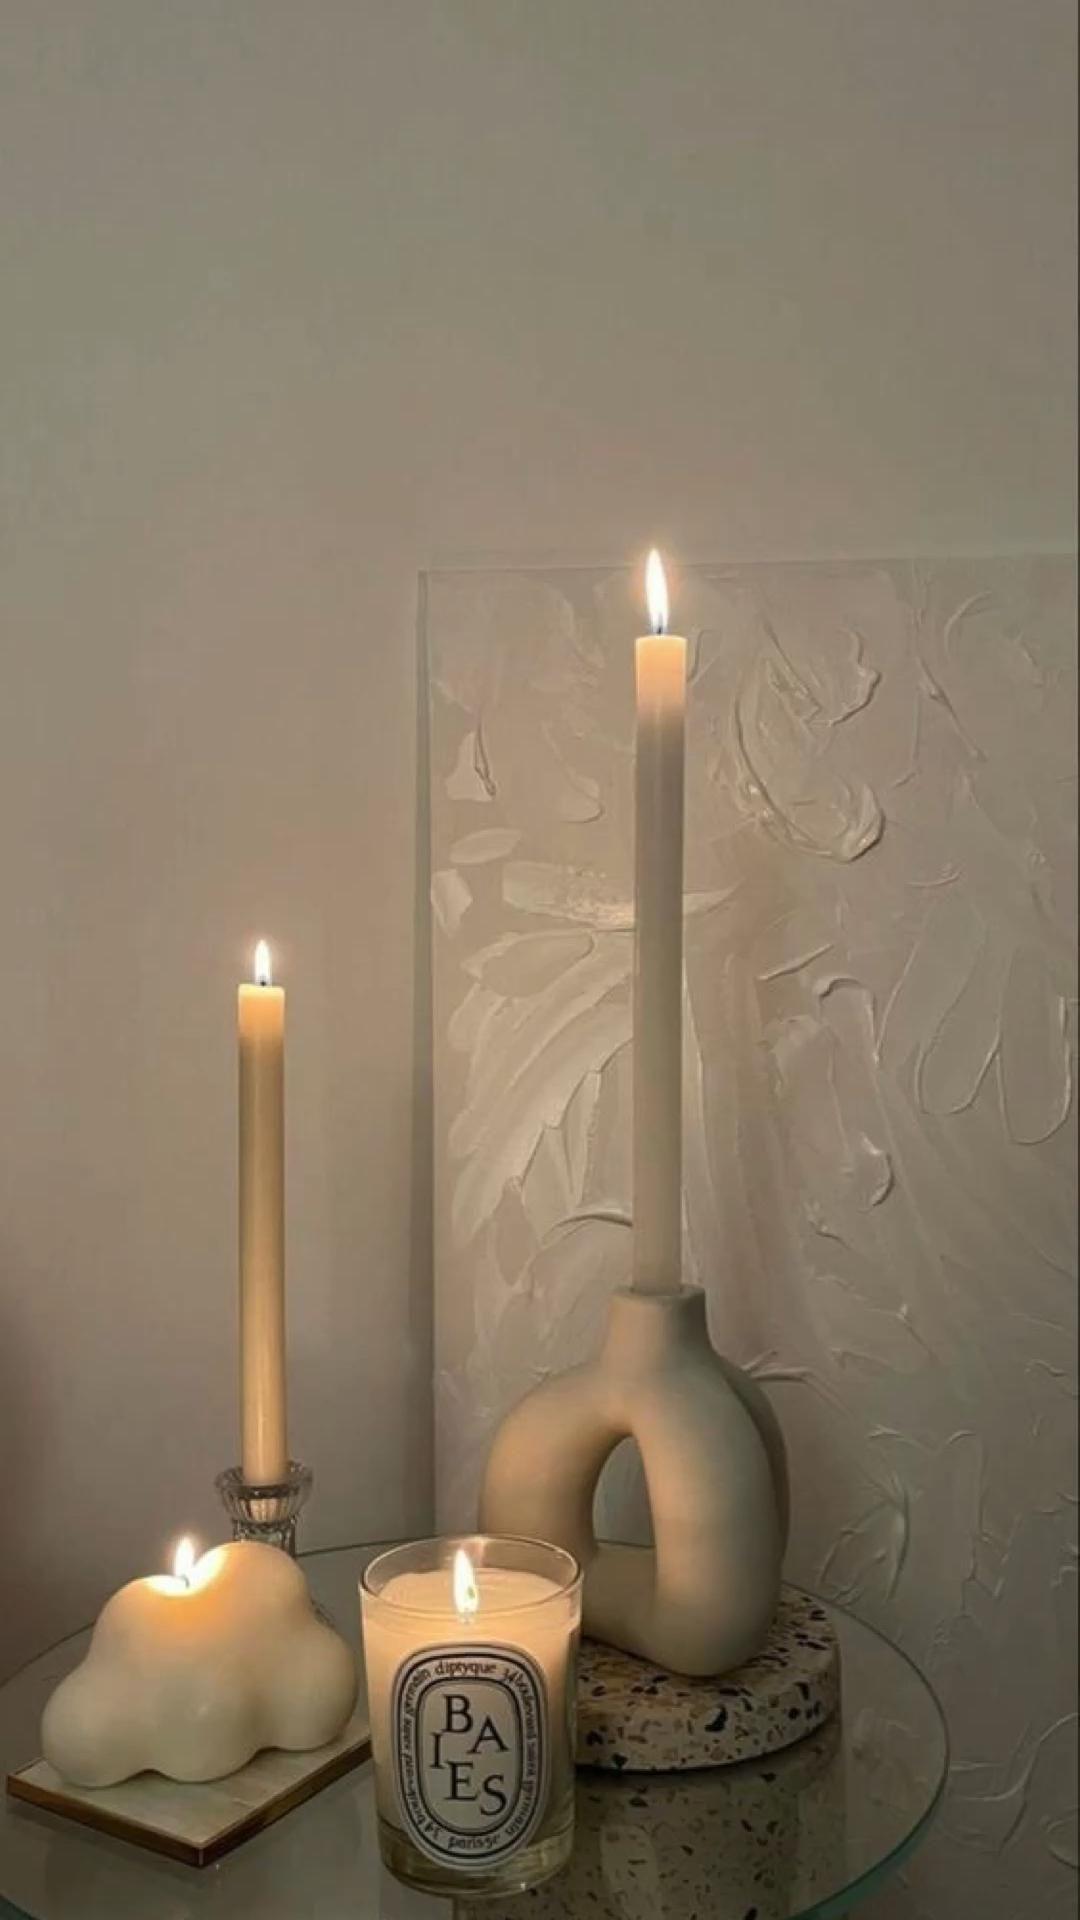 A marca de velas aromáticas e perfumes favoritos das celebridades